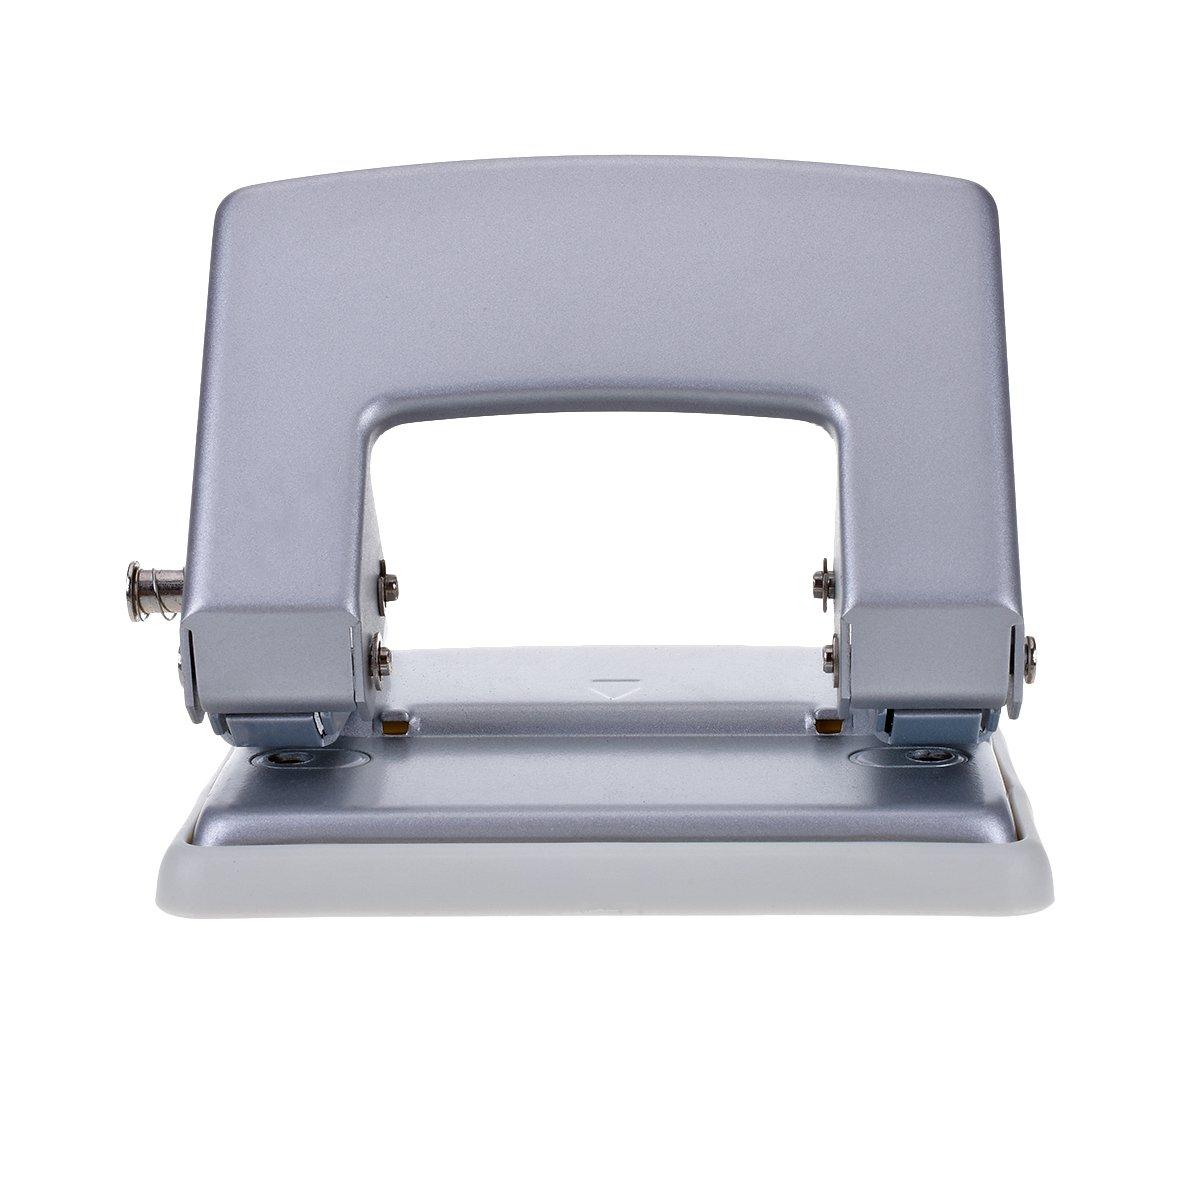 tankerstreet Perforatrice rotondo scrapbooking 3fori metallo 8fogli con vassoio [facile da pulire], argento, 2 Trous